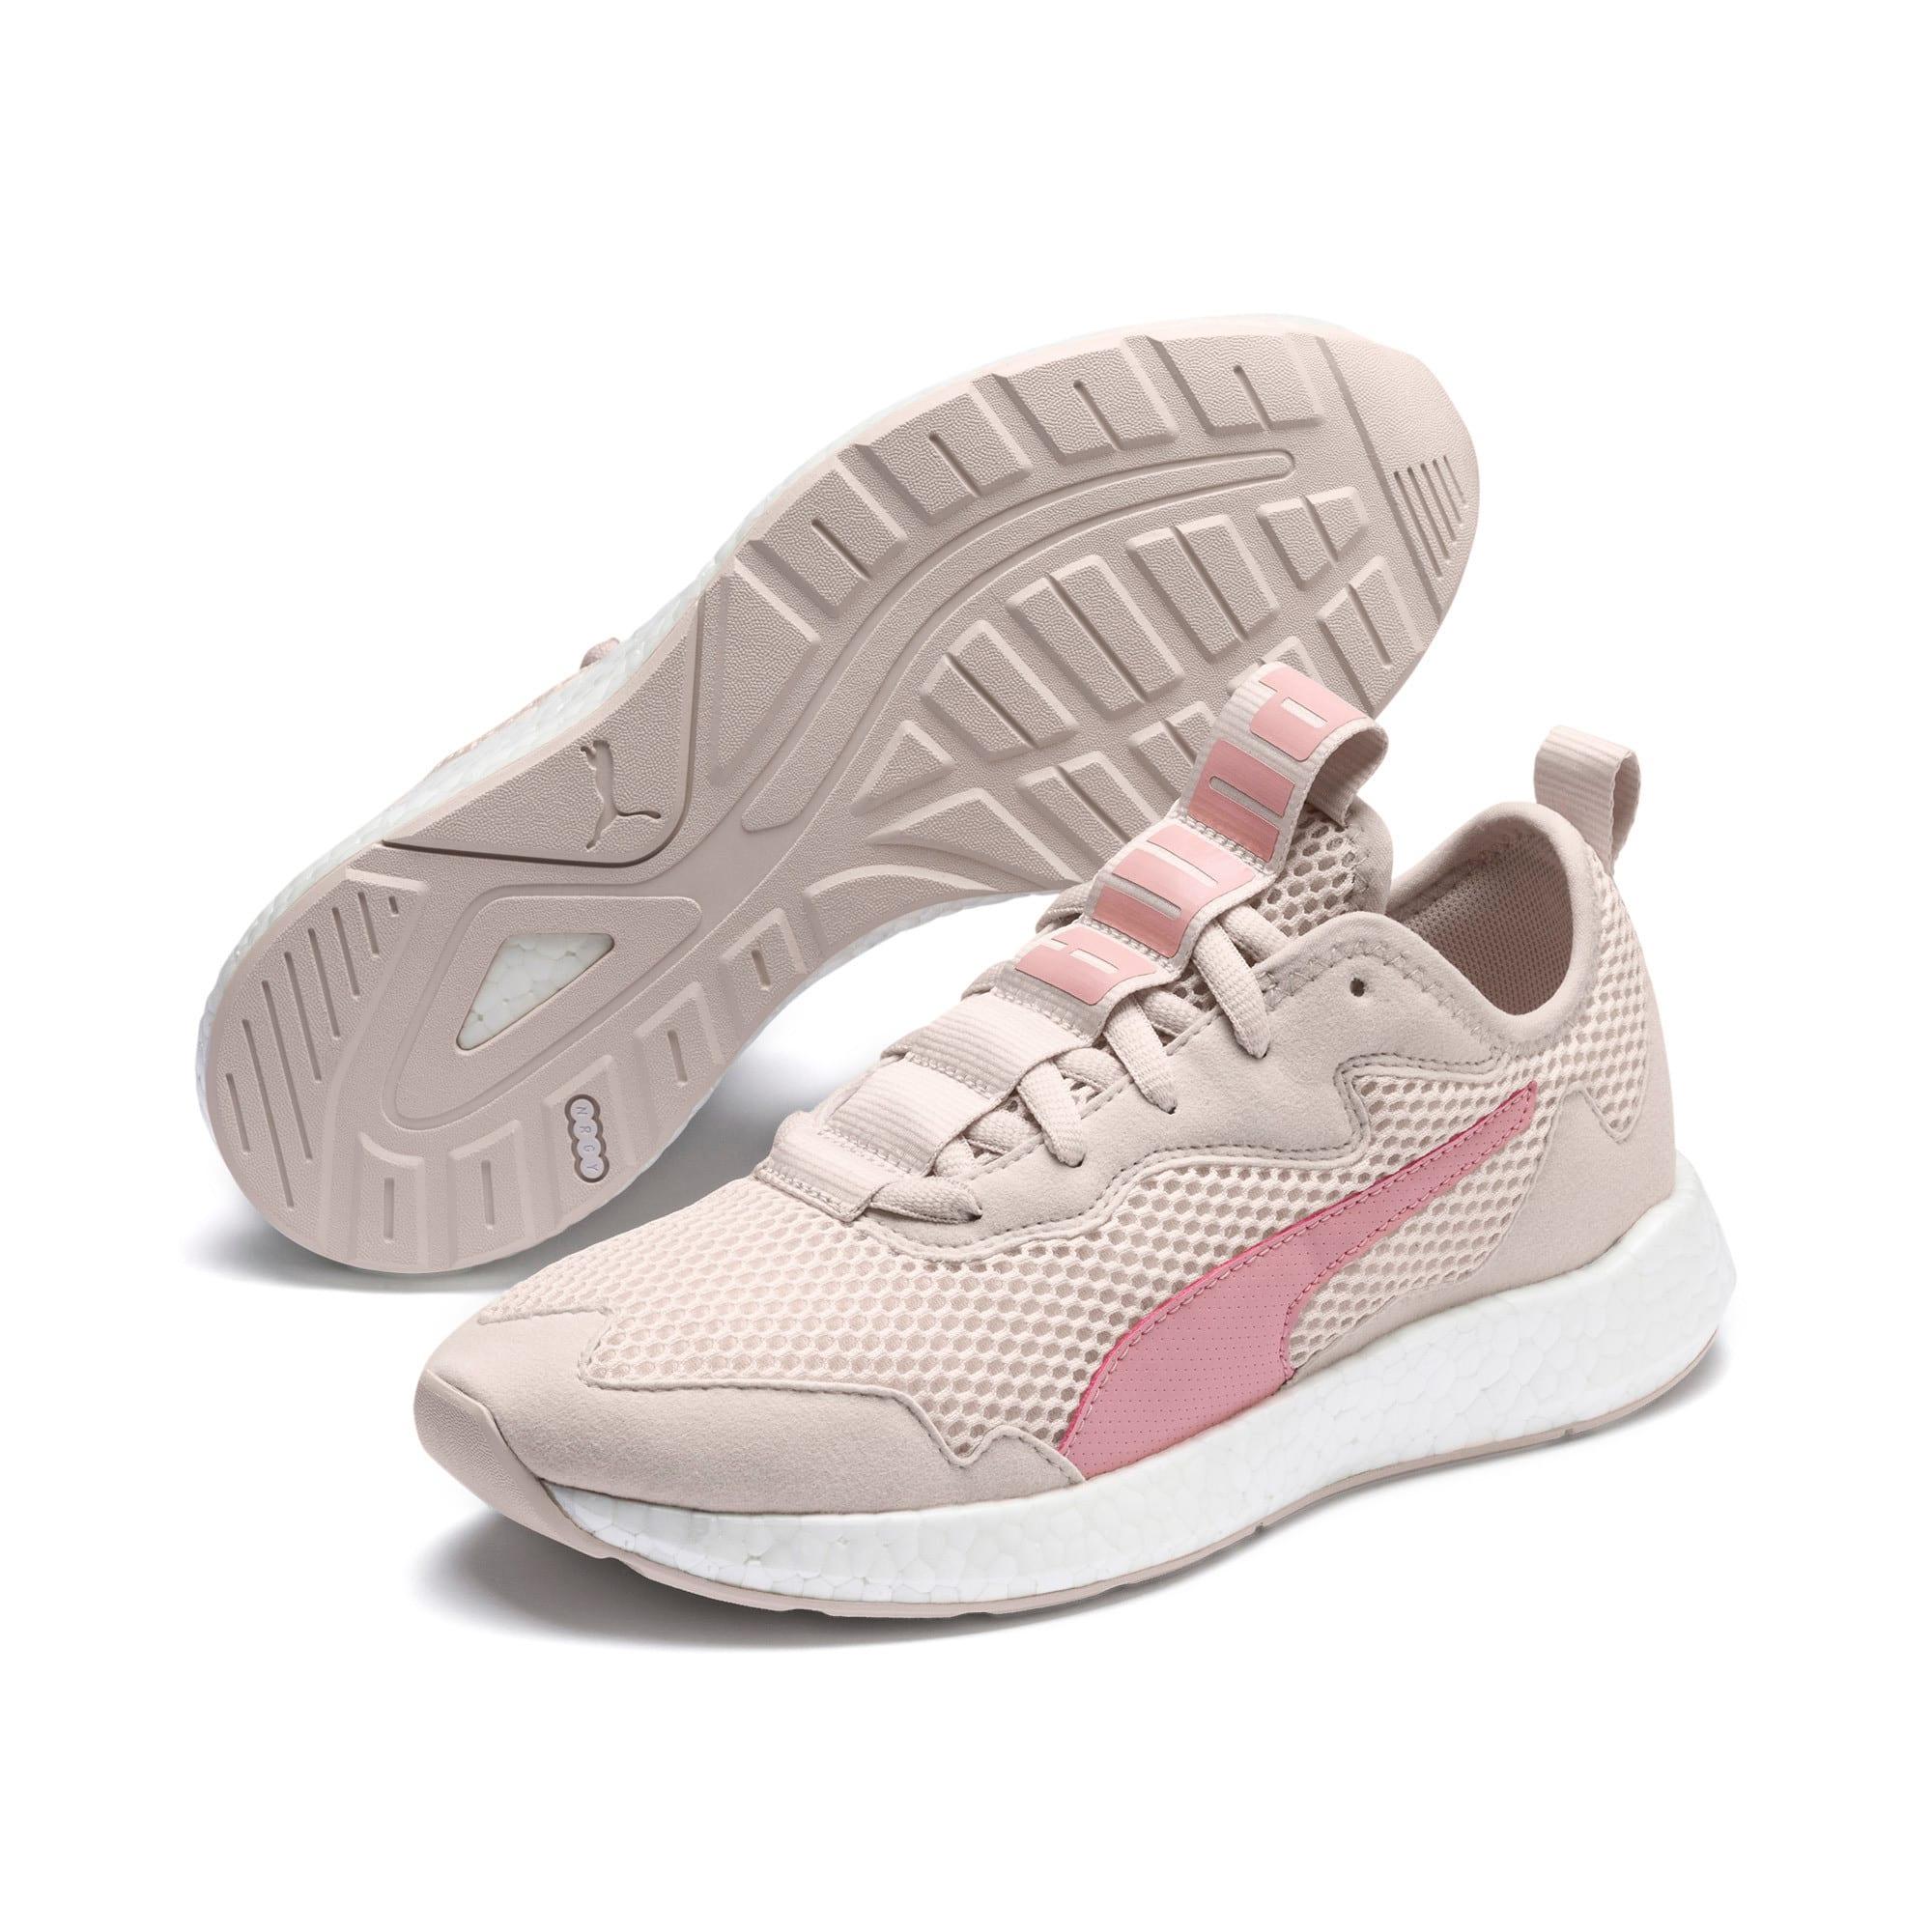 Thumbnail 3 of NRGY Neko Skim Women's Running Shoes, Pastel Parchment-Bridal Rose, medium